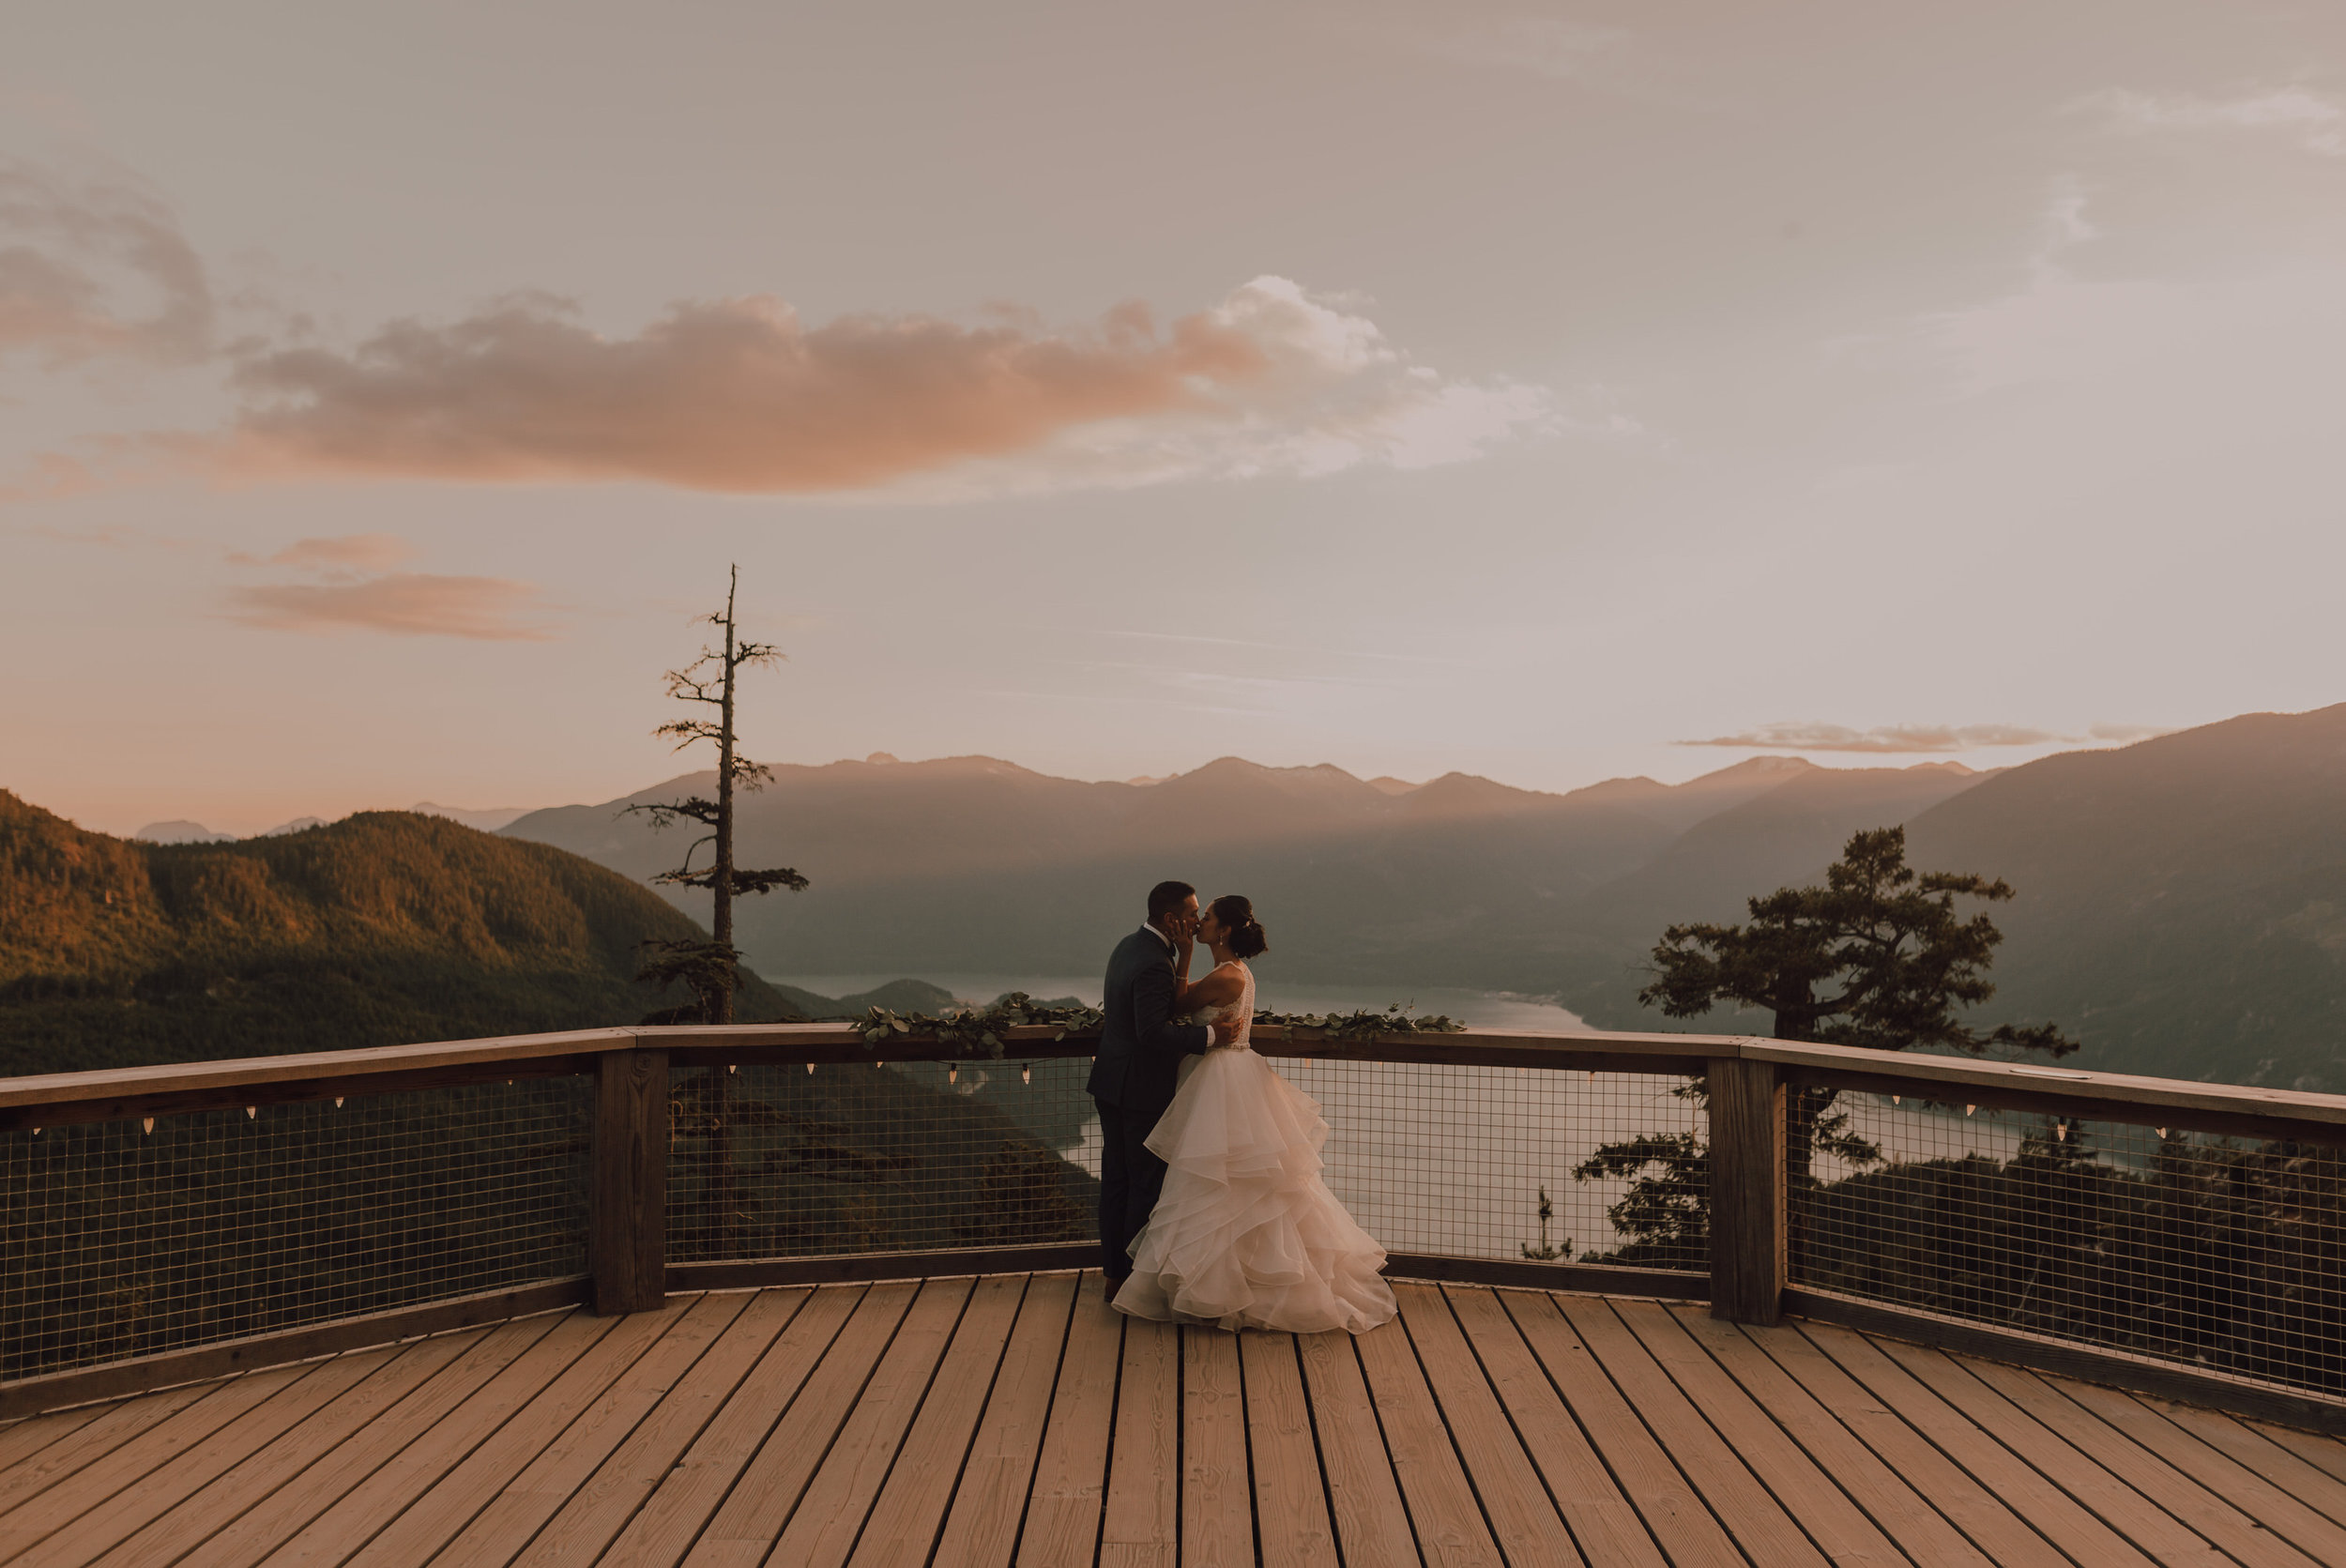 Squamish Wedding Photographer - Sea to Sky Gondola Wedding Photos -  Vancouver Wedding Photographer & Videographer - Sunshine Coast Wedding Photos - Sunshine Coast Wedding Photographer - Jennifer Picard Photography - IMG_5262.jpg